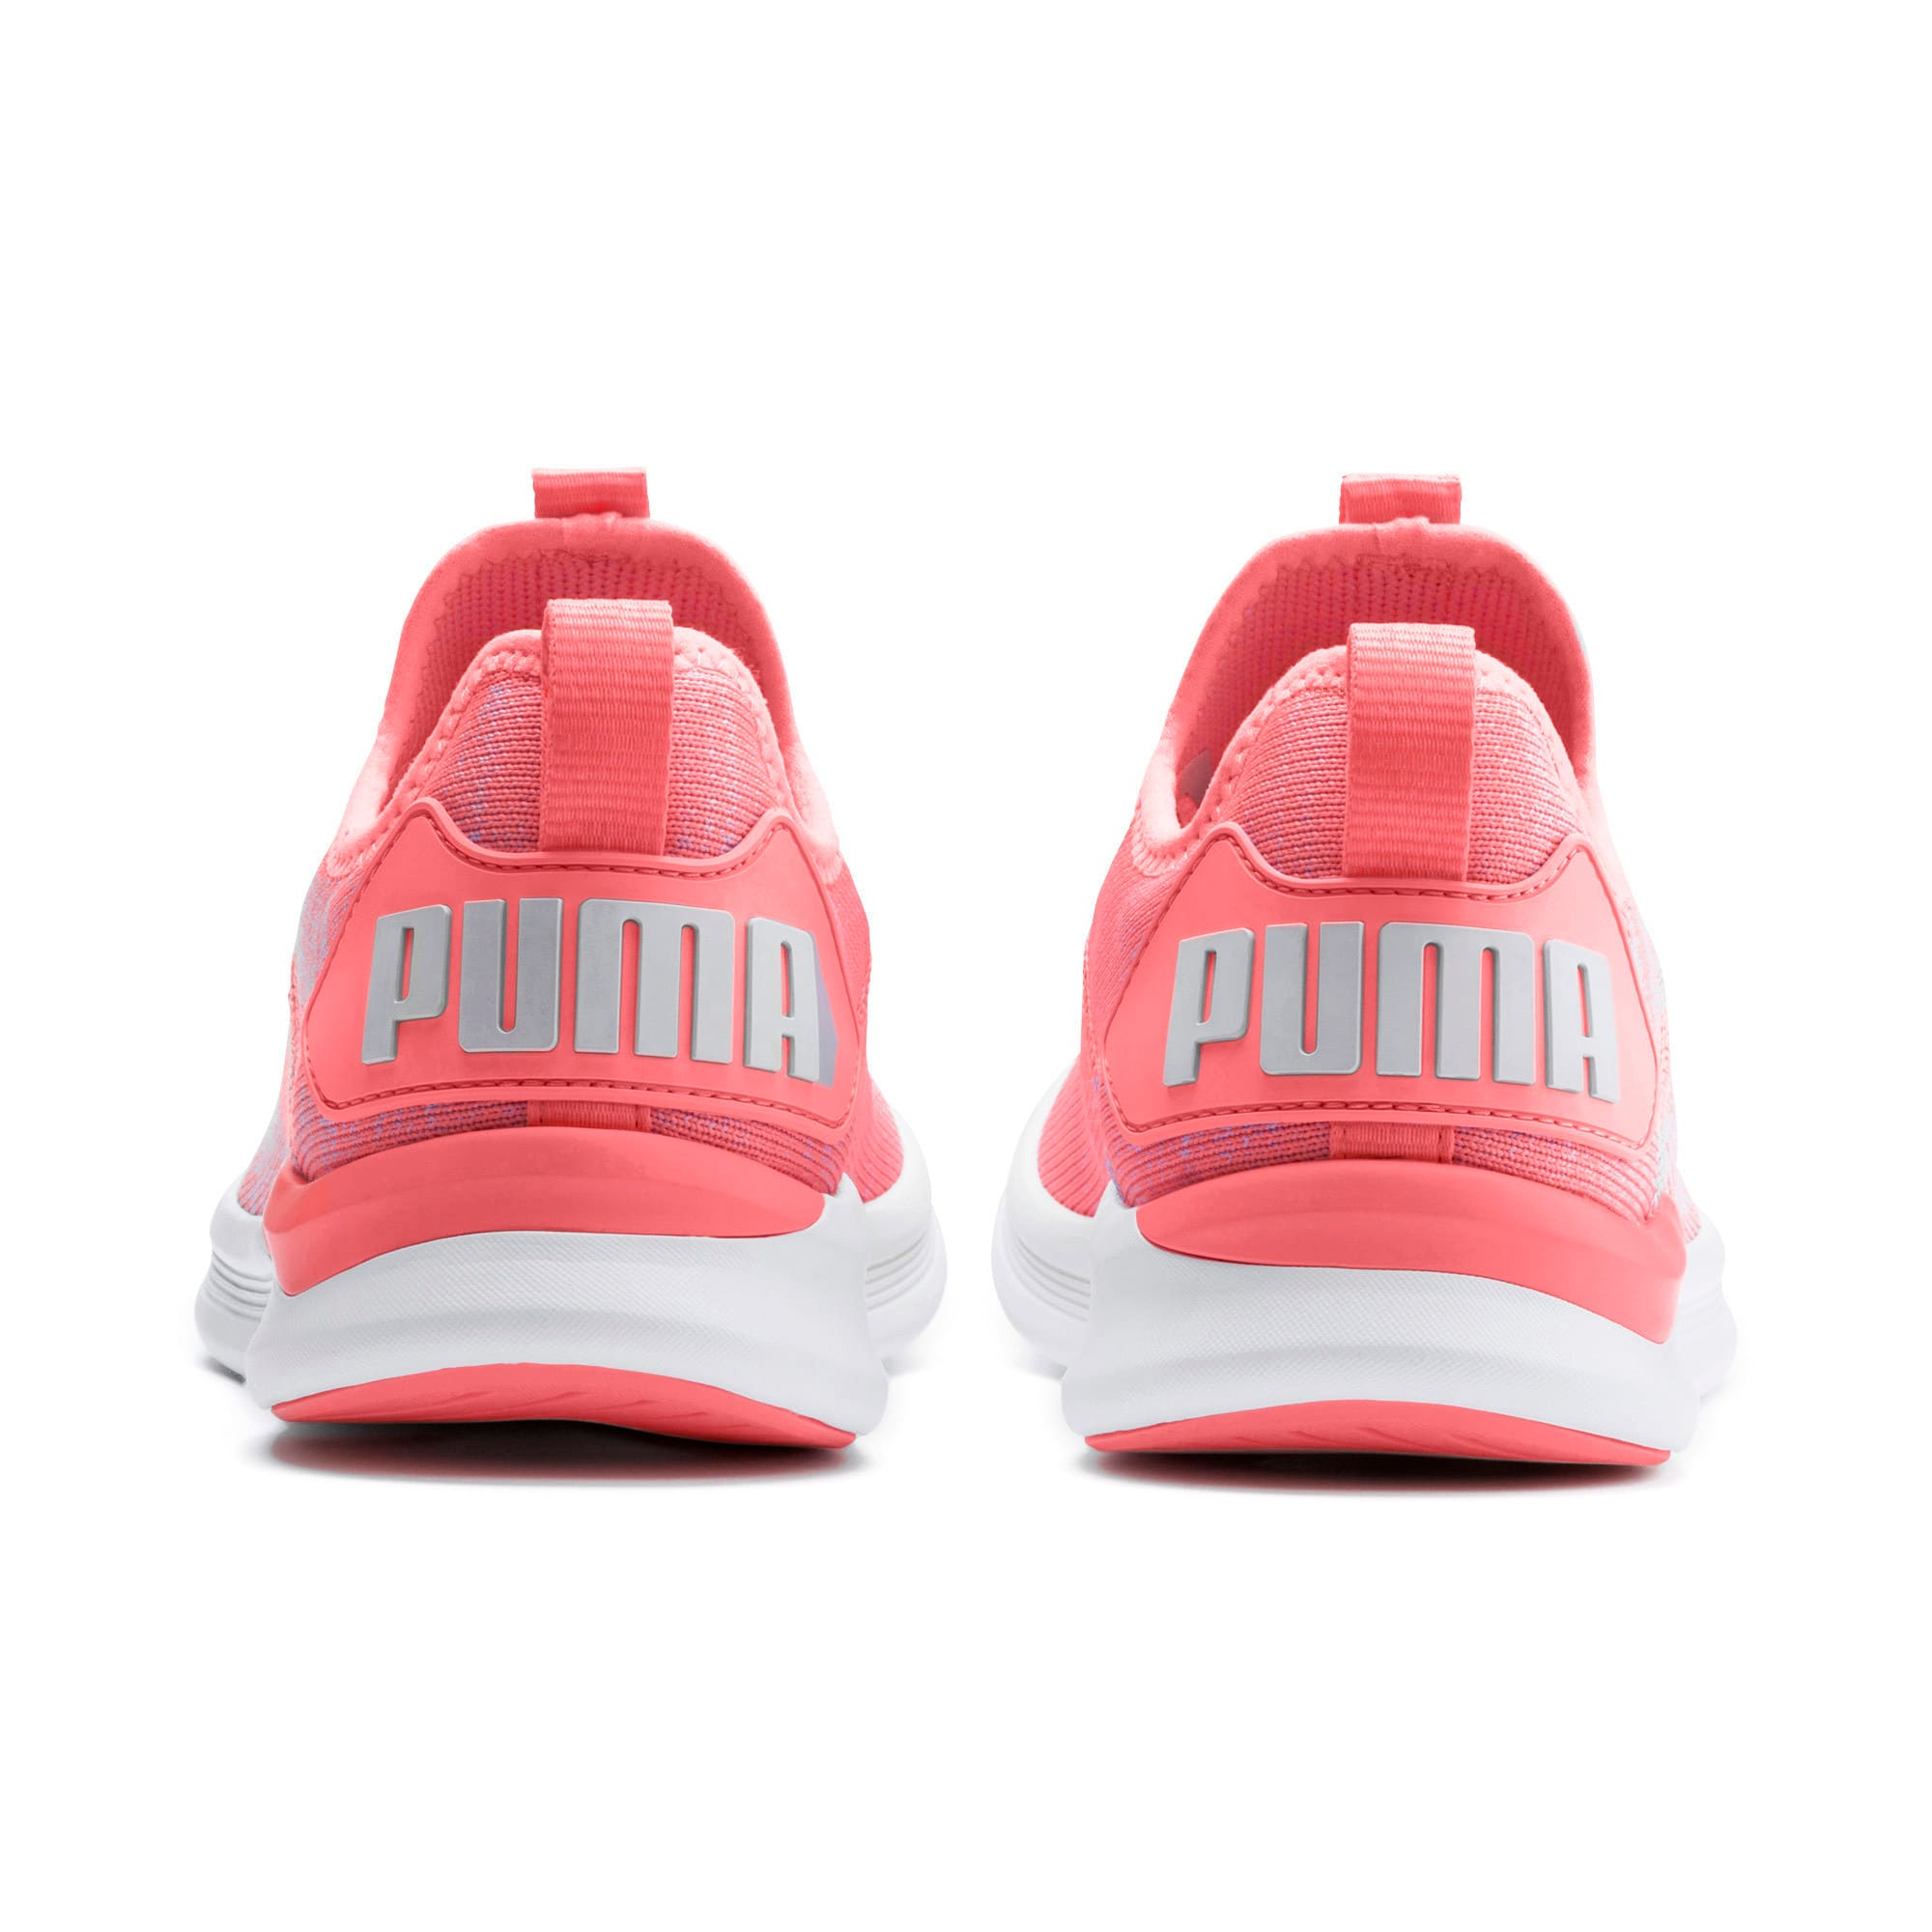 Thumbnail 4 of IGNITE Flash evoKNIT Women's Running Shoes, Bright Peach-Puma White, medium